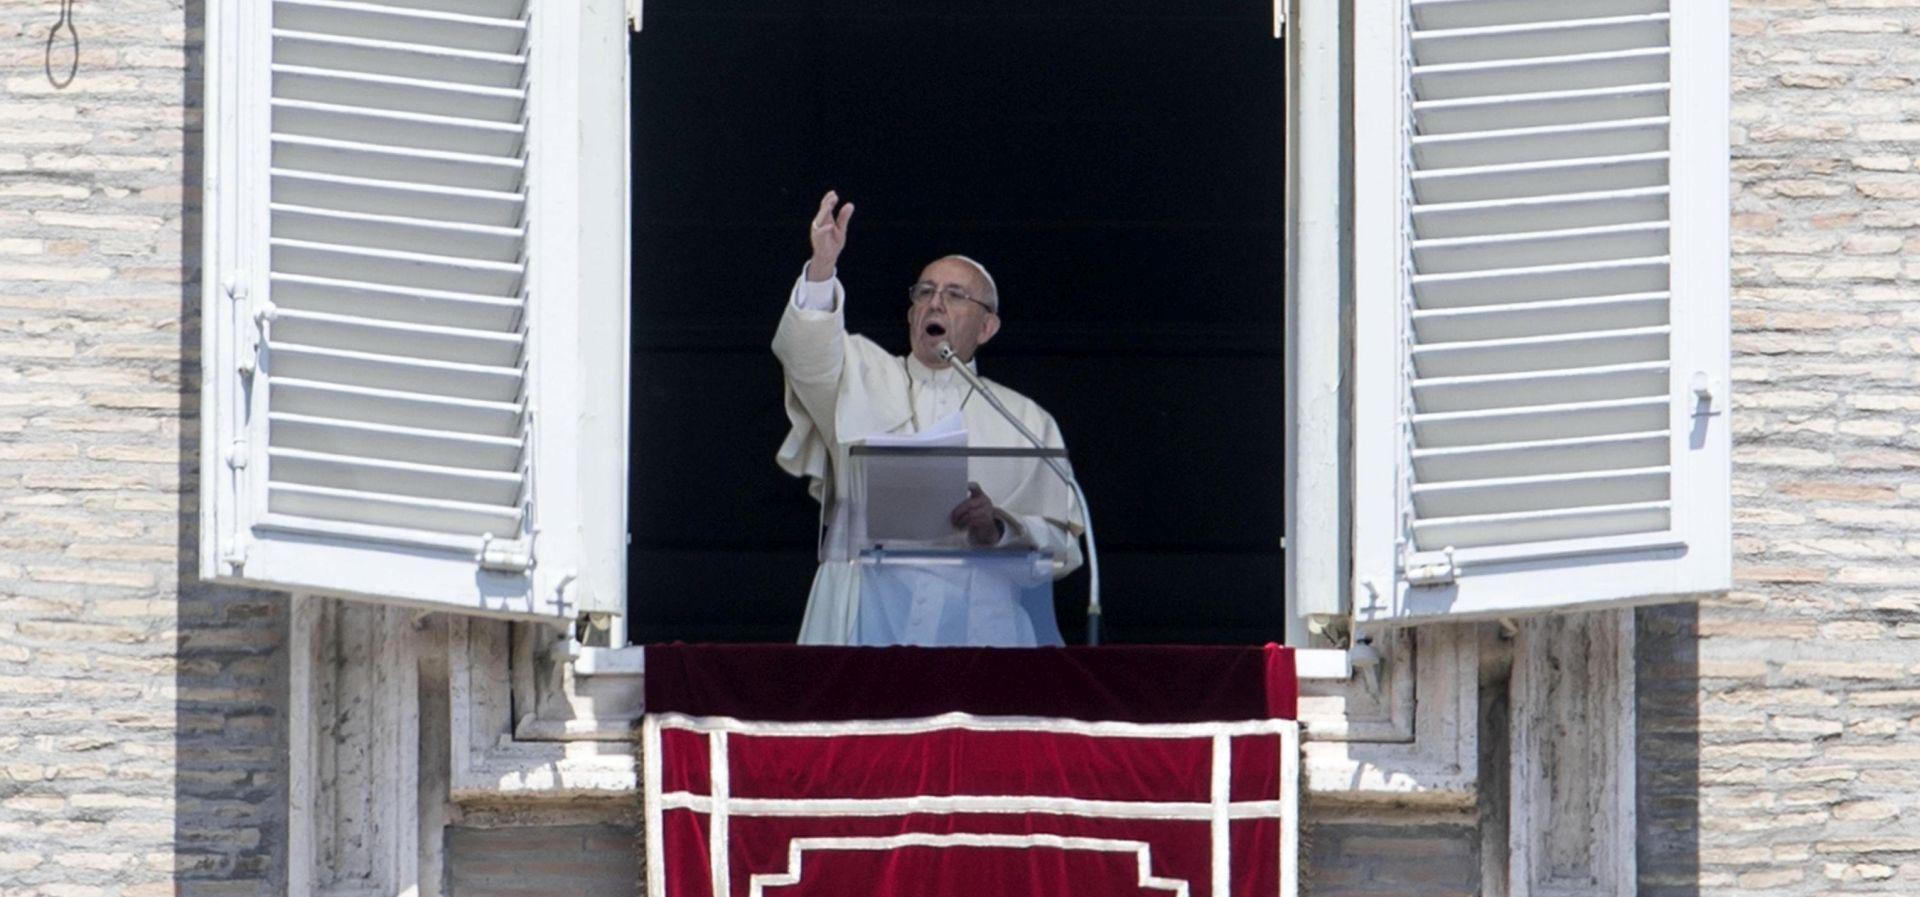 Papa Franjo će imenovati pet novih kardinala